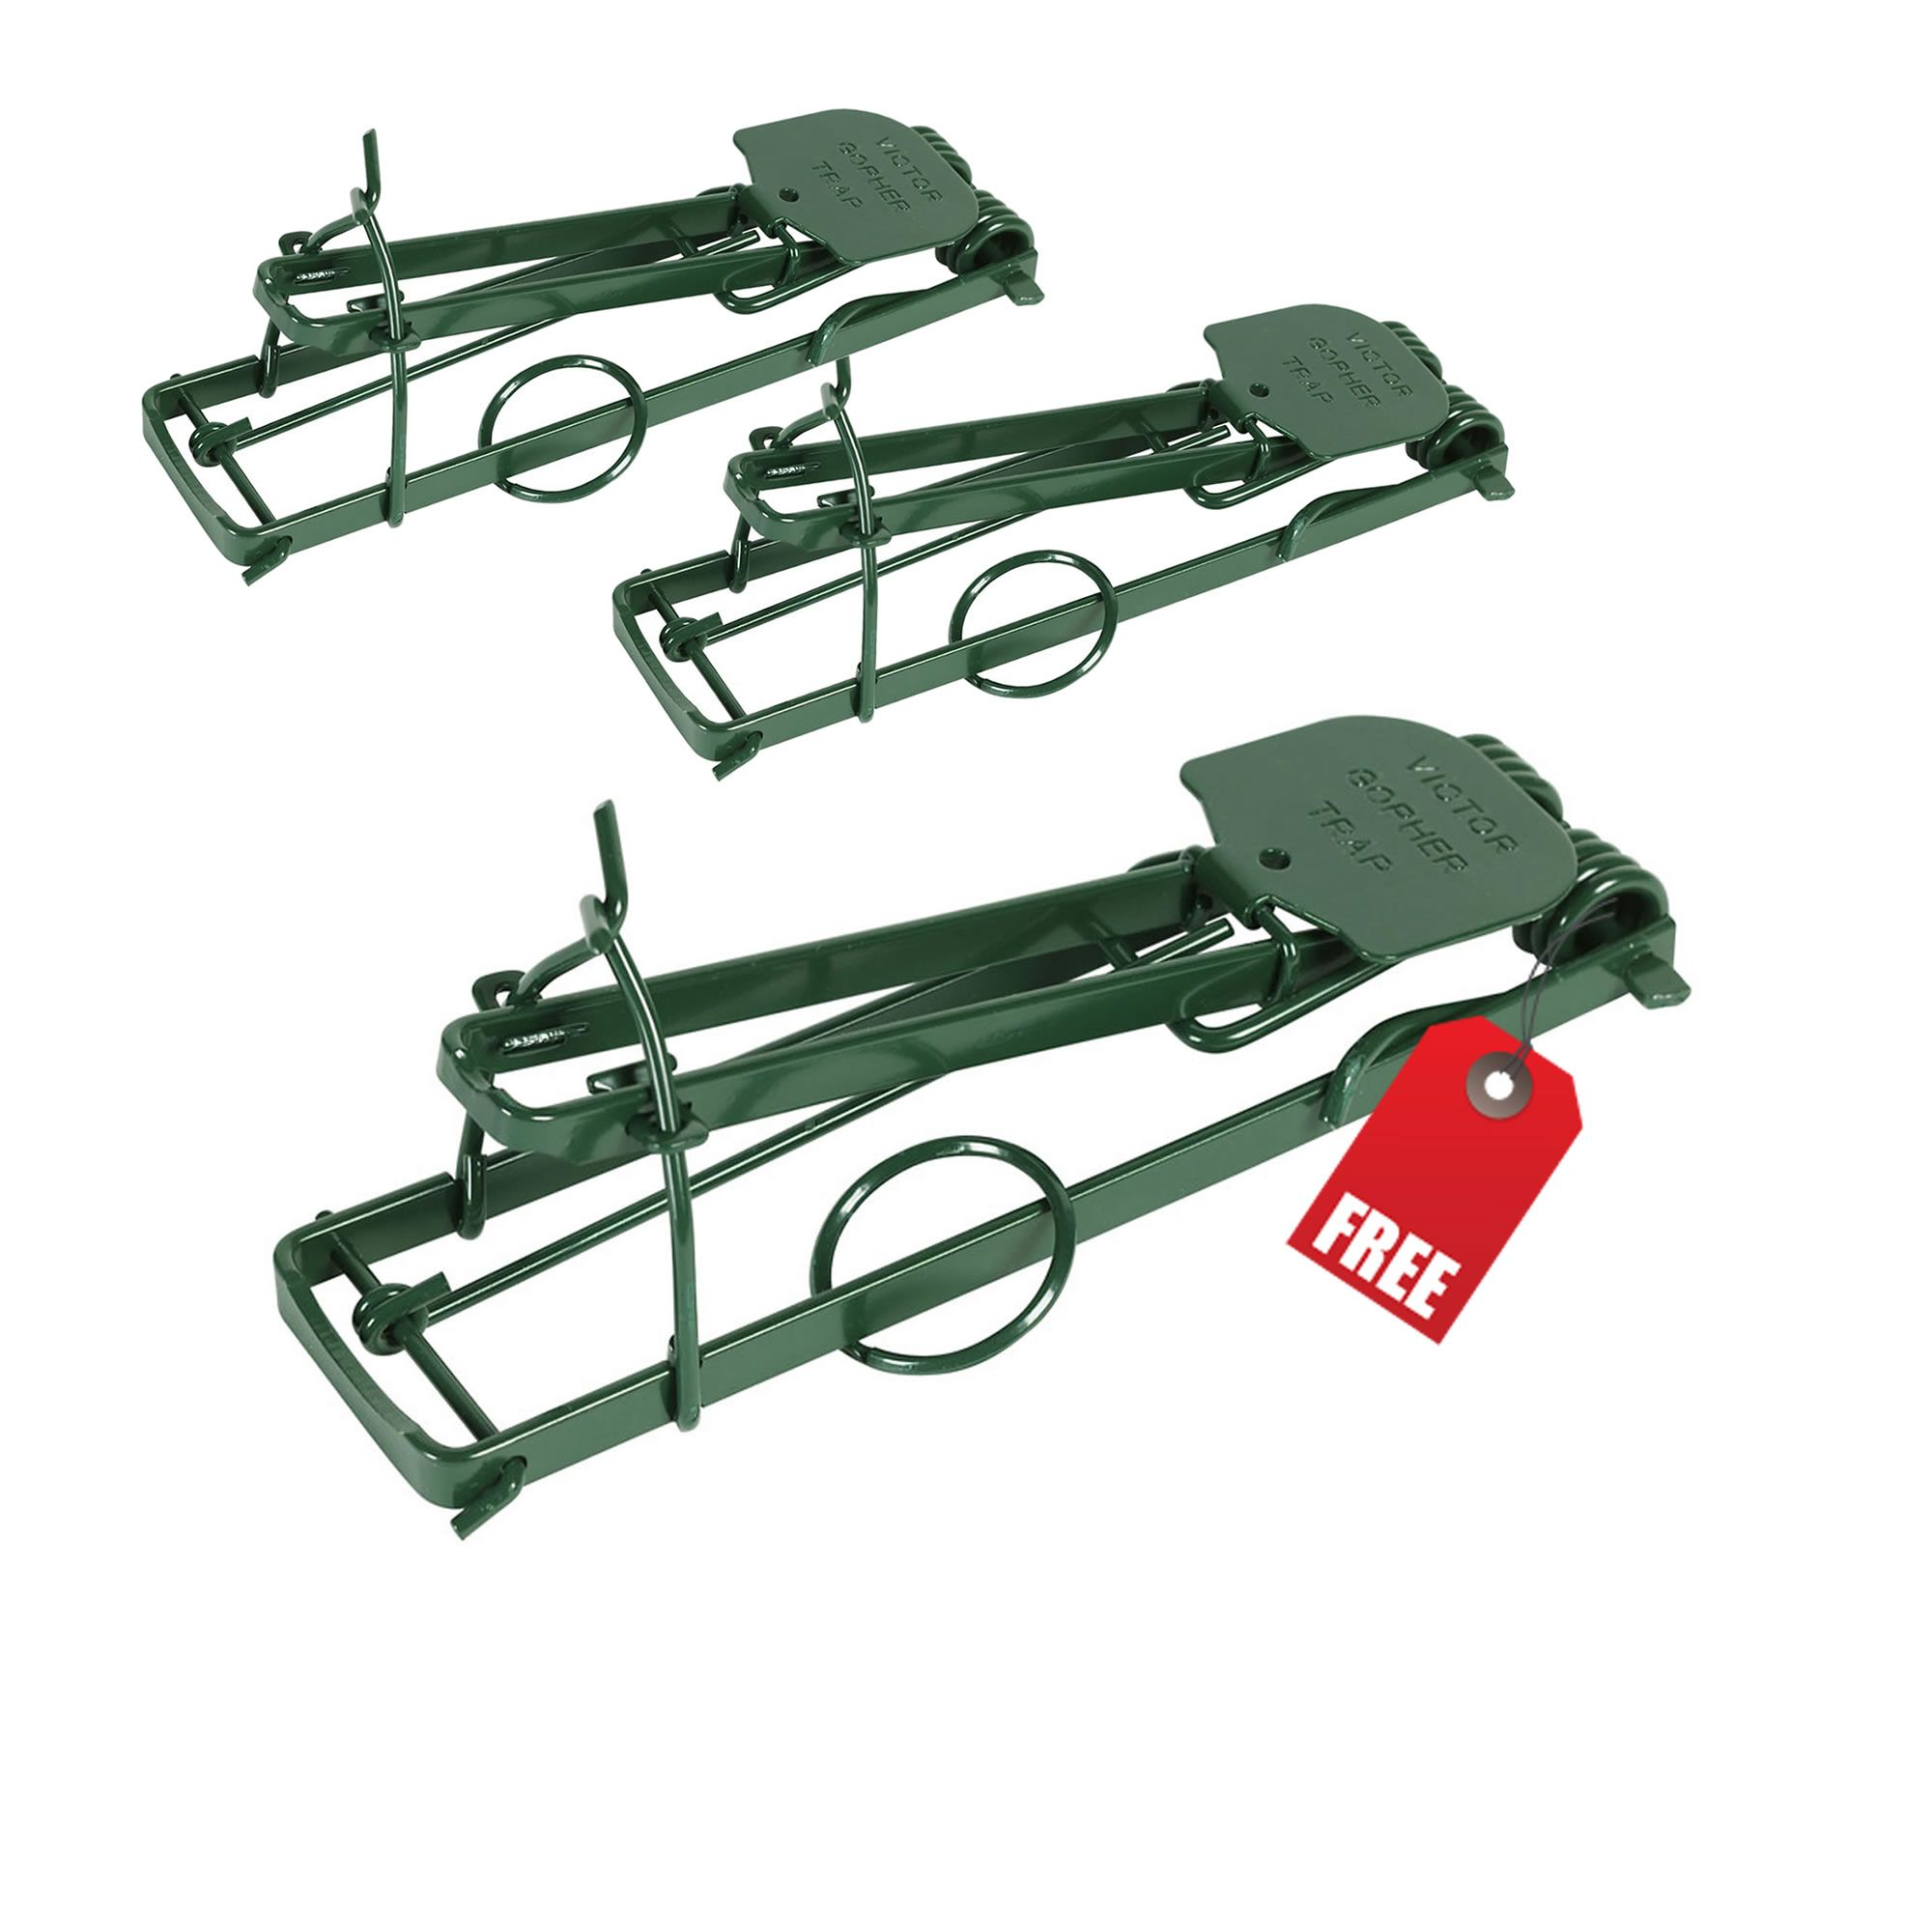 Victor® Gopher Trap, Model # B0615-3